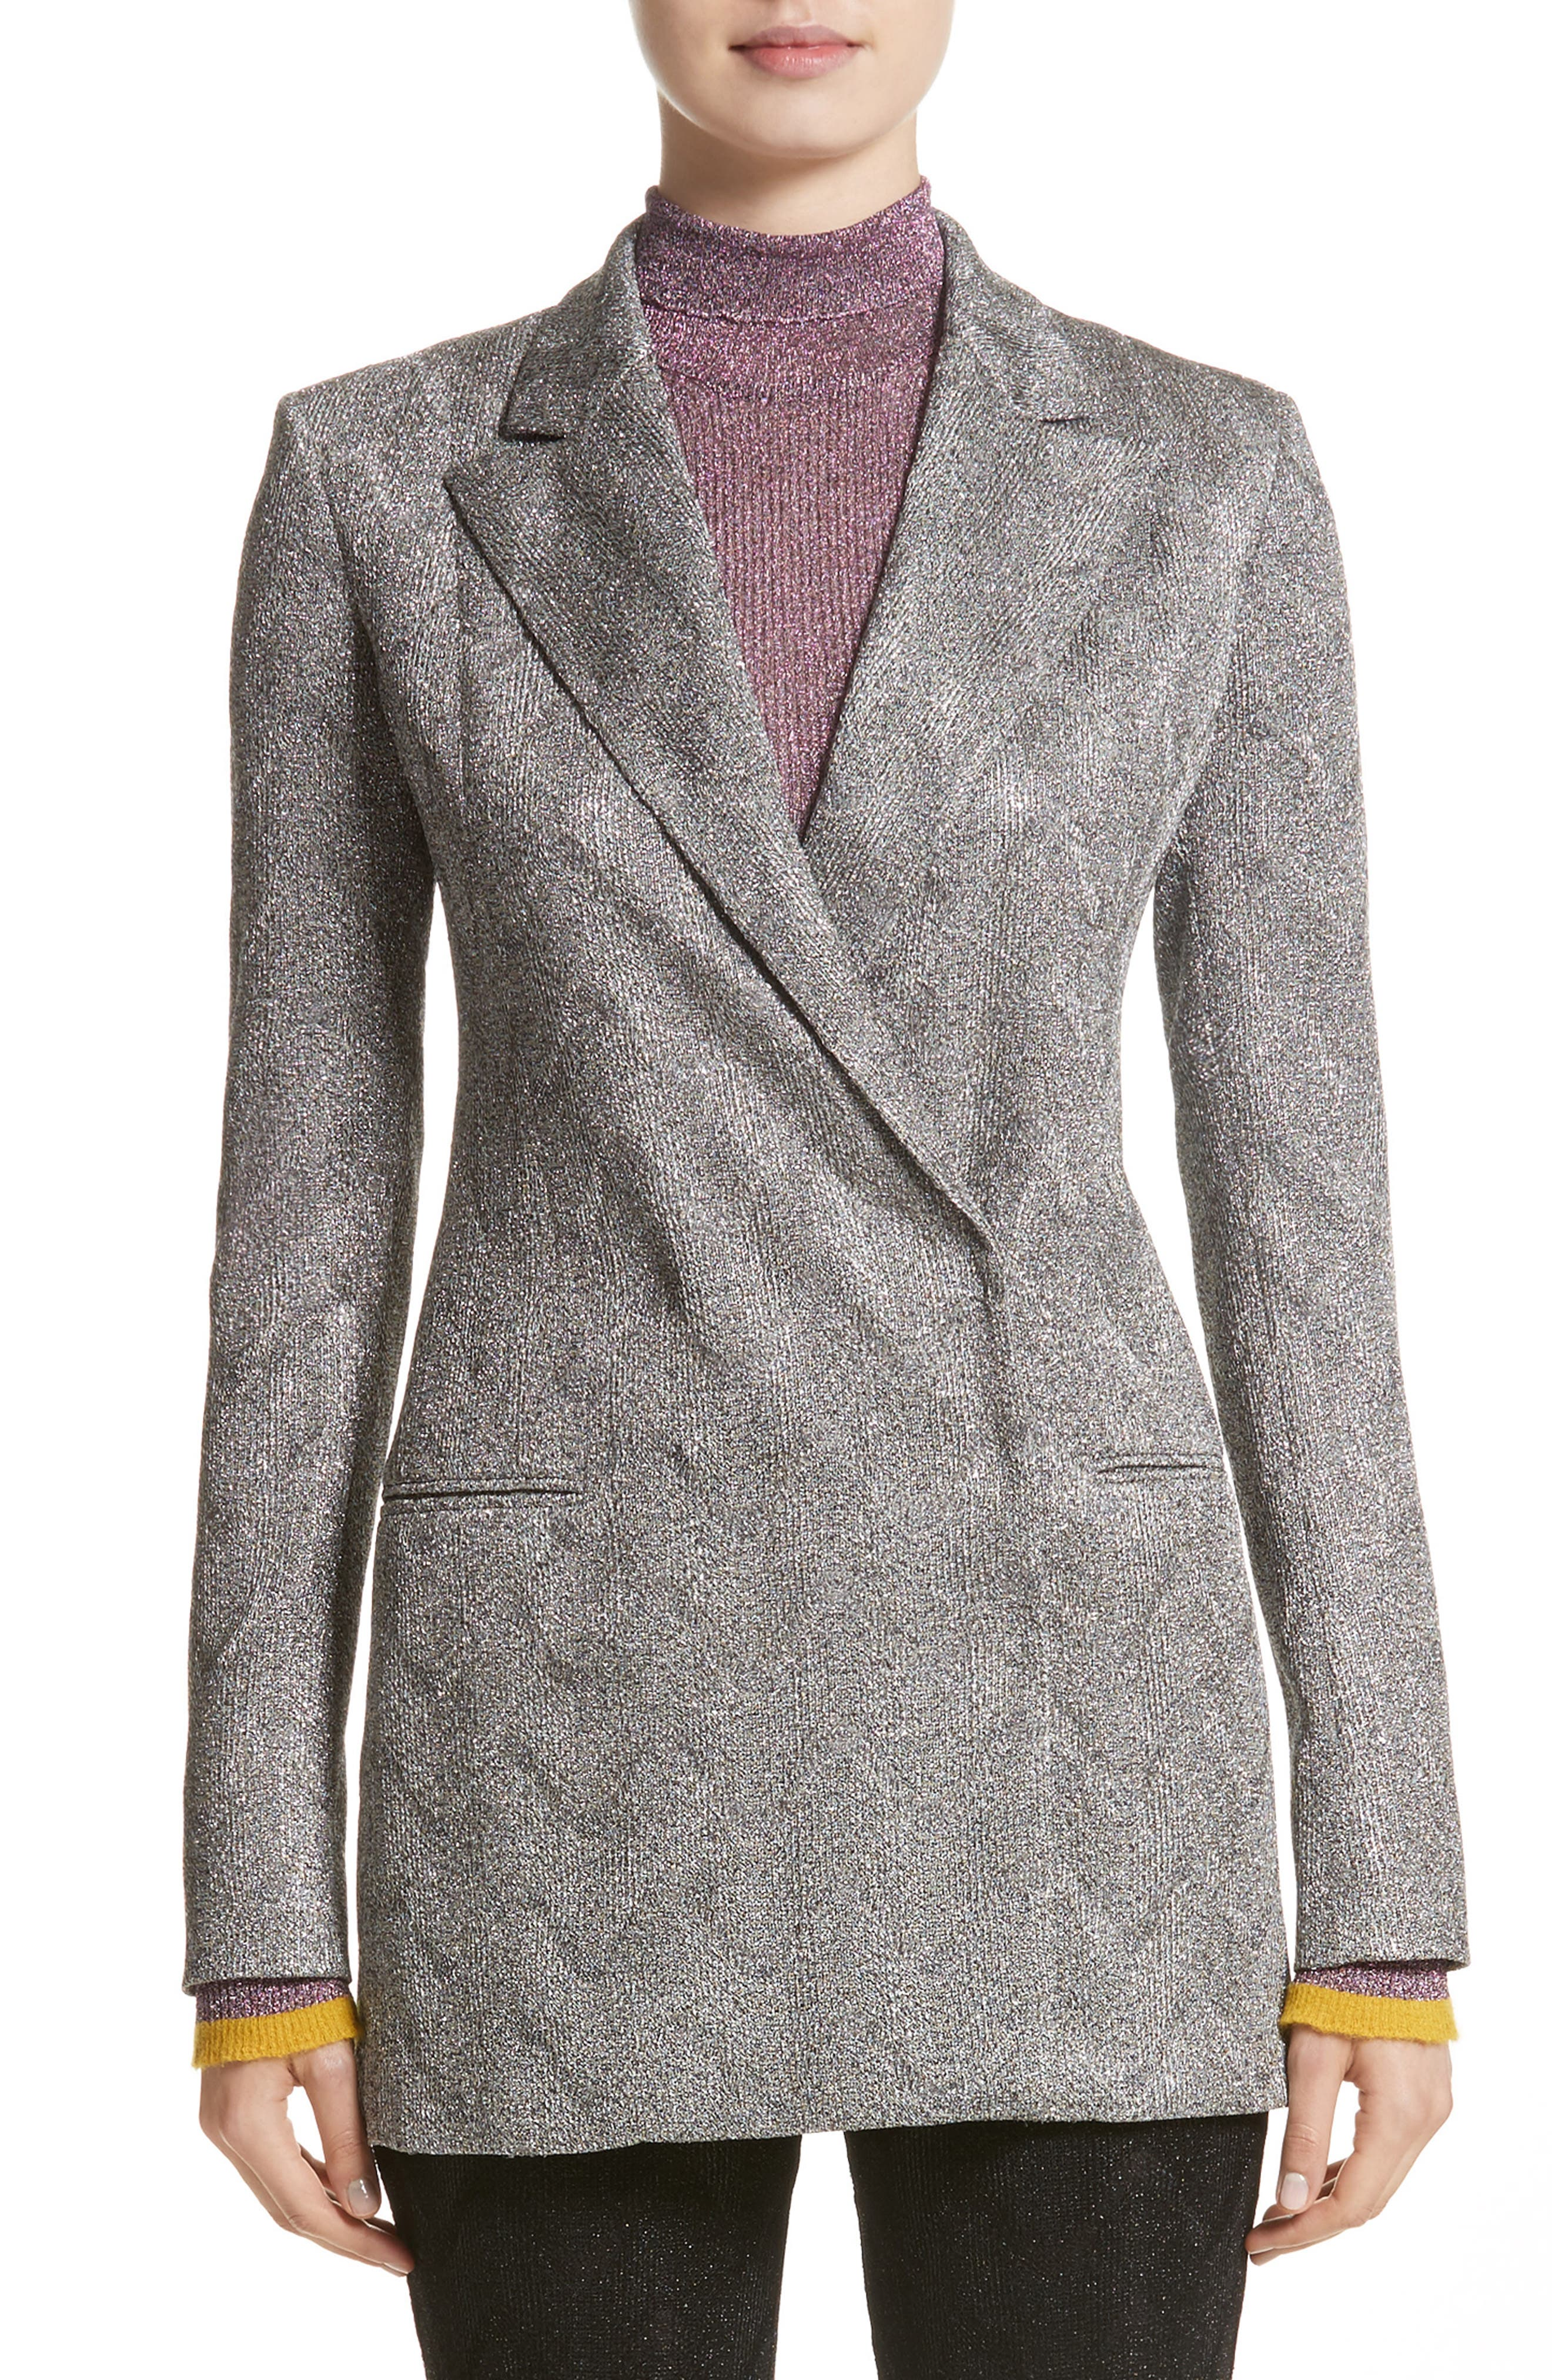 Missoni Metallic Knit Double Breasted Jacket